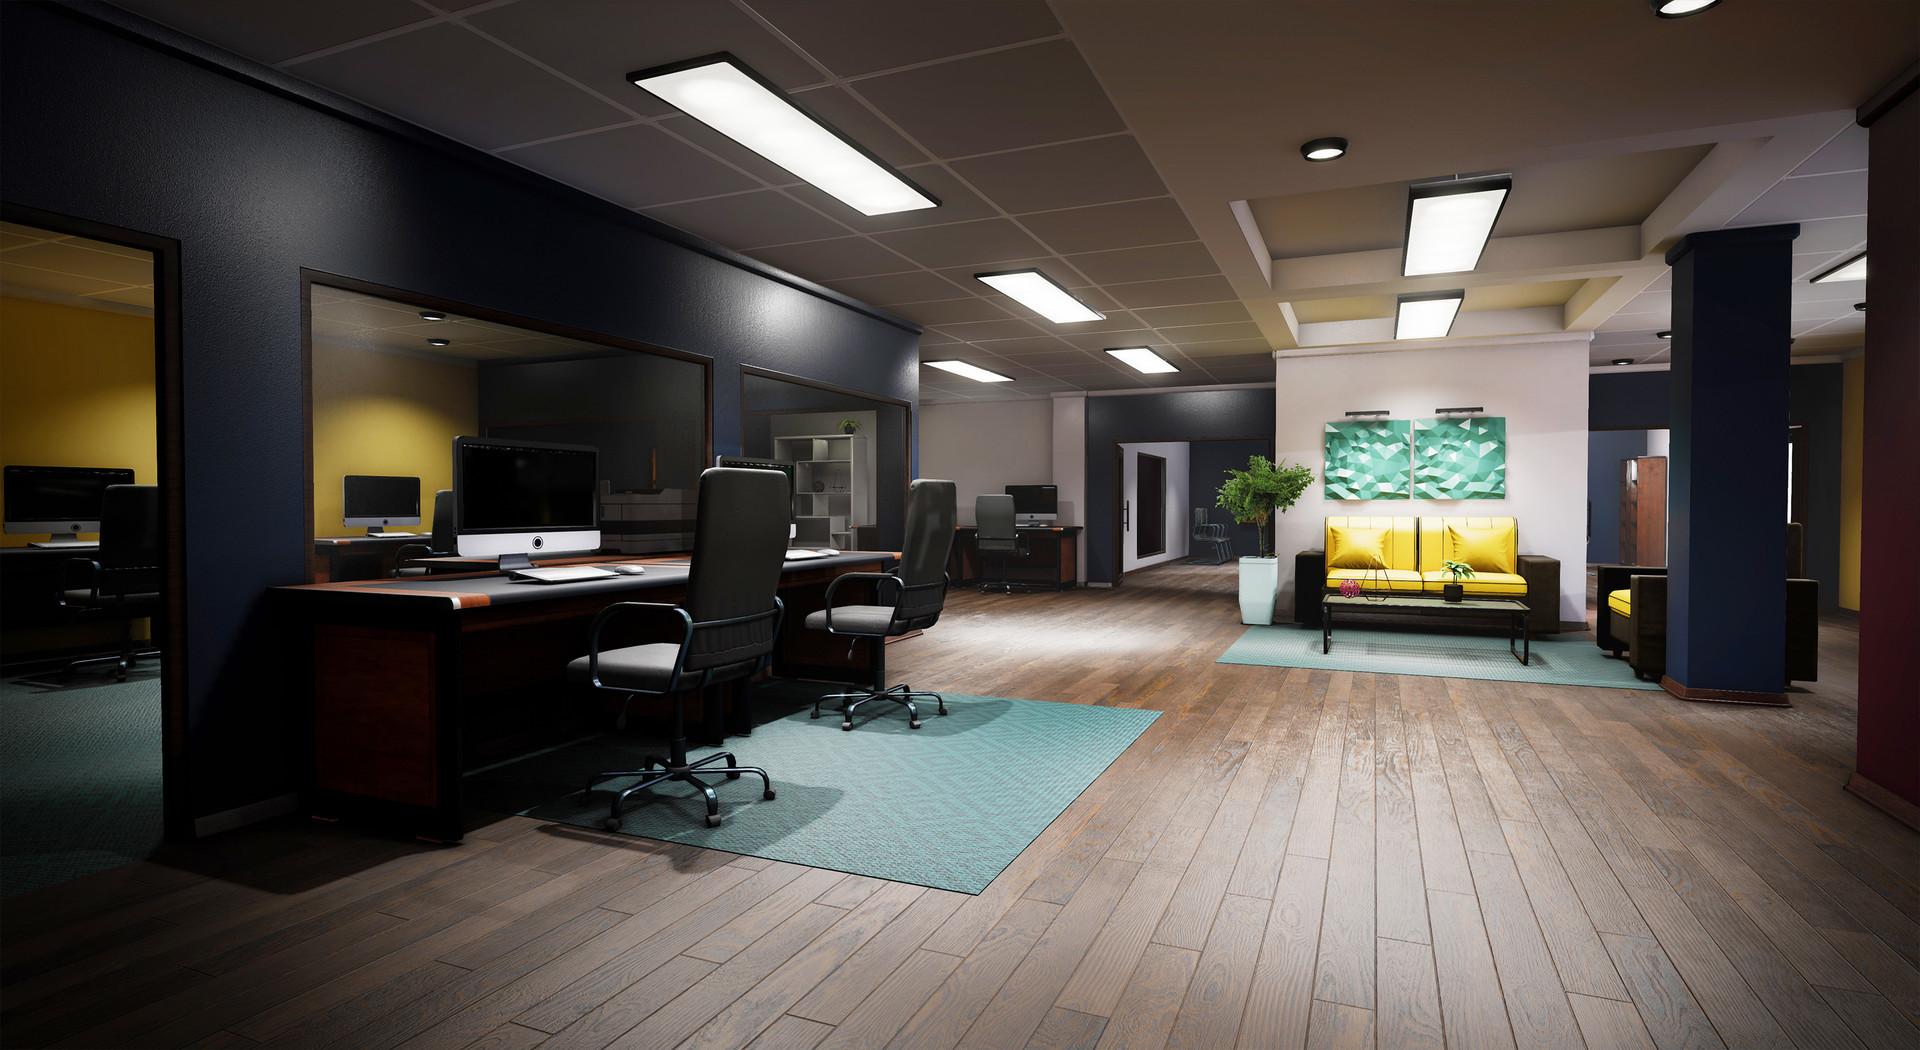 Modular Office Environment